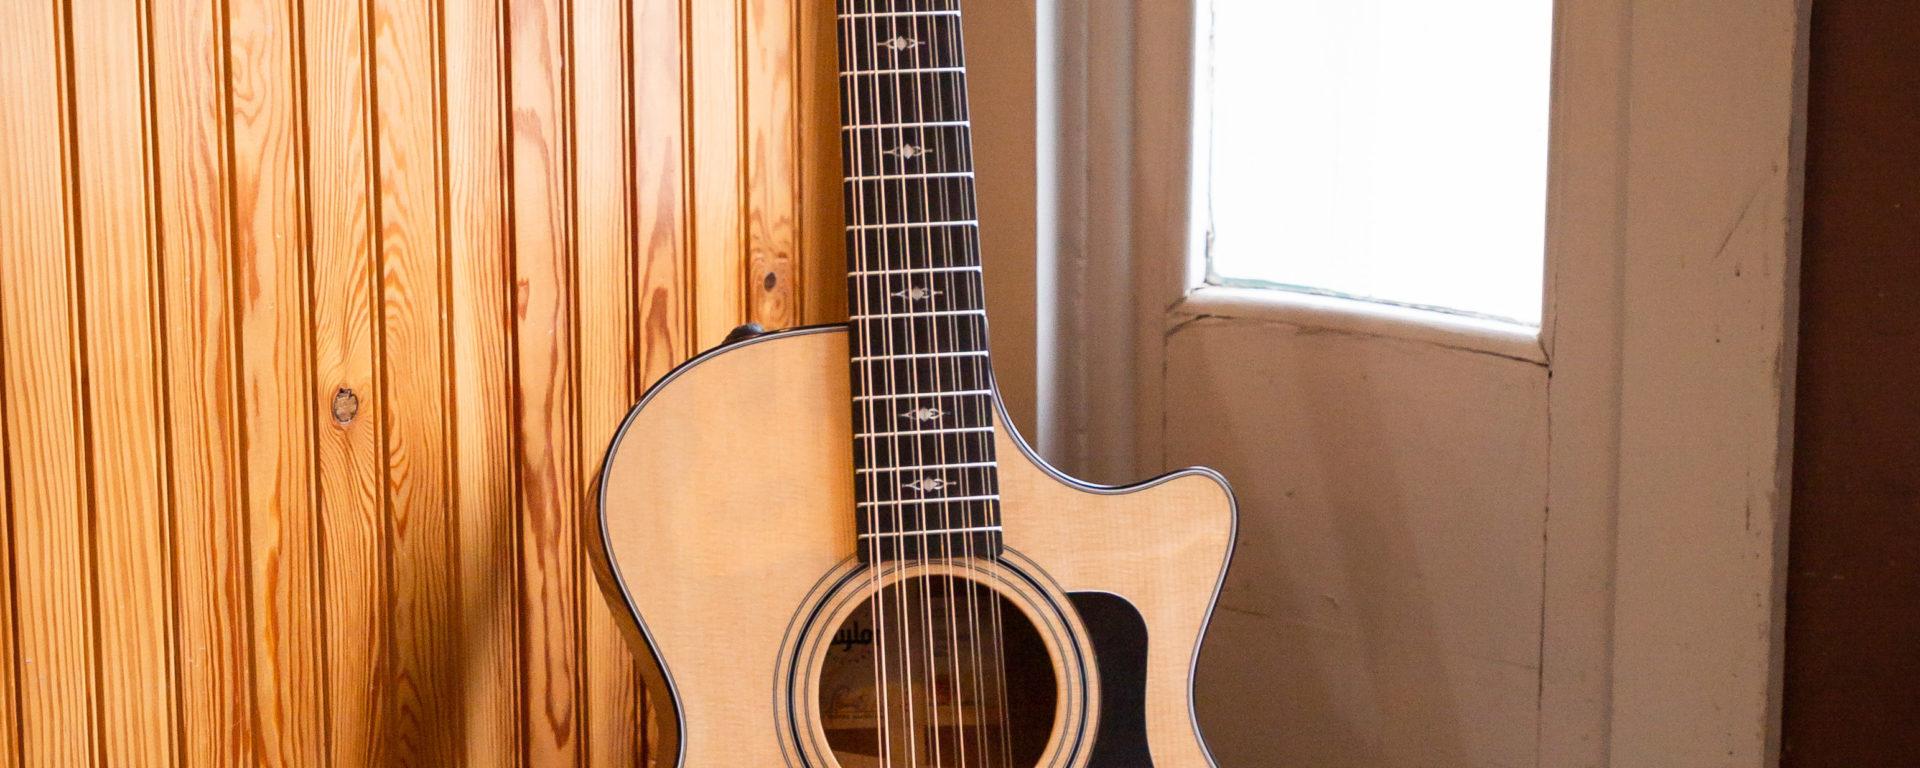 Taylor 352ce 12-String